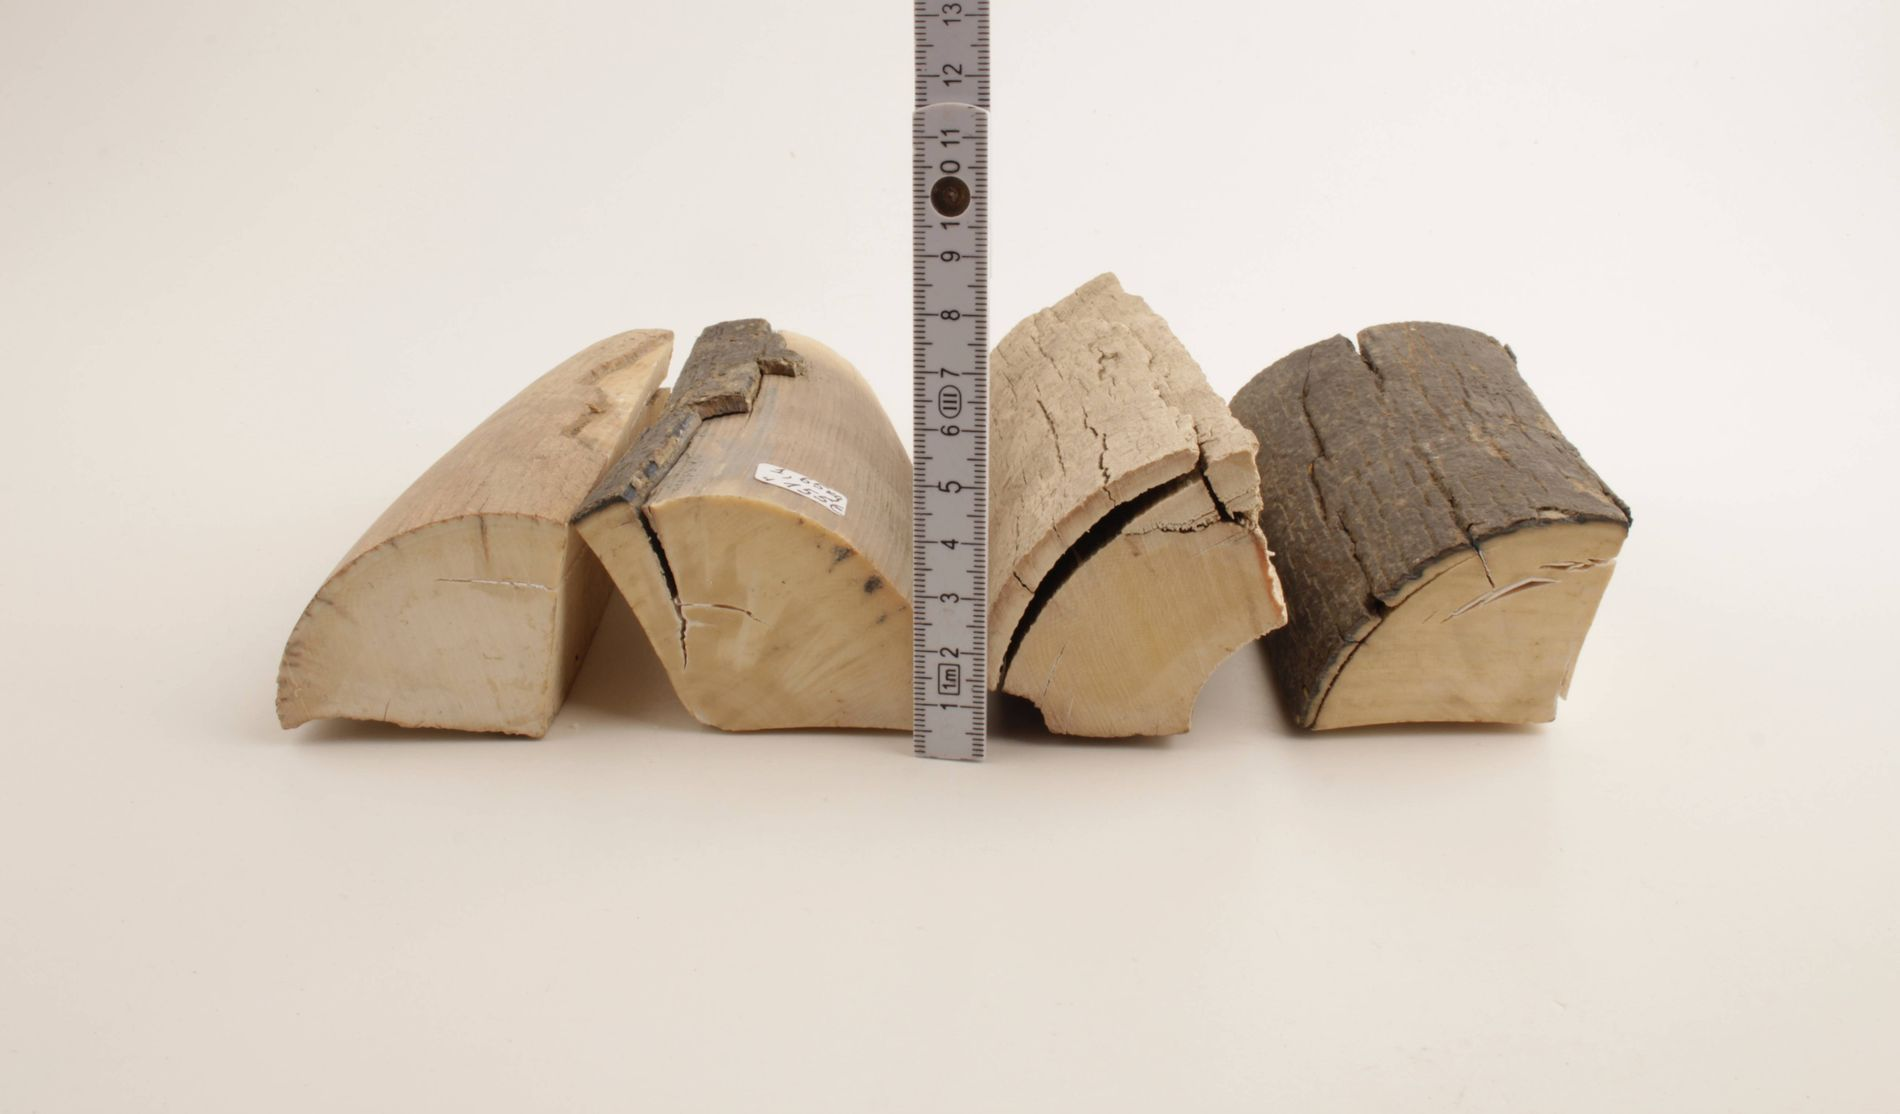 Untreated mammoth tusk offcuts